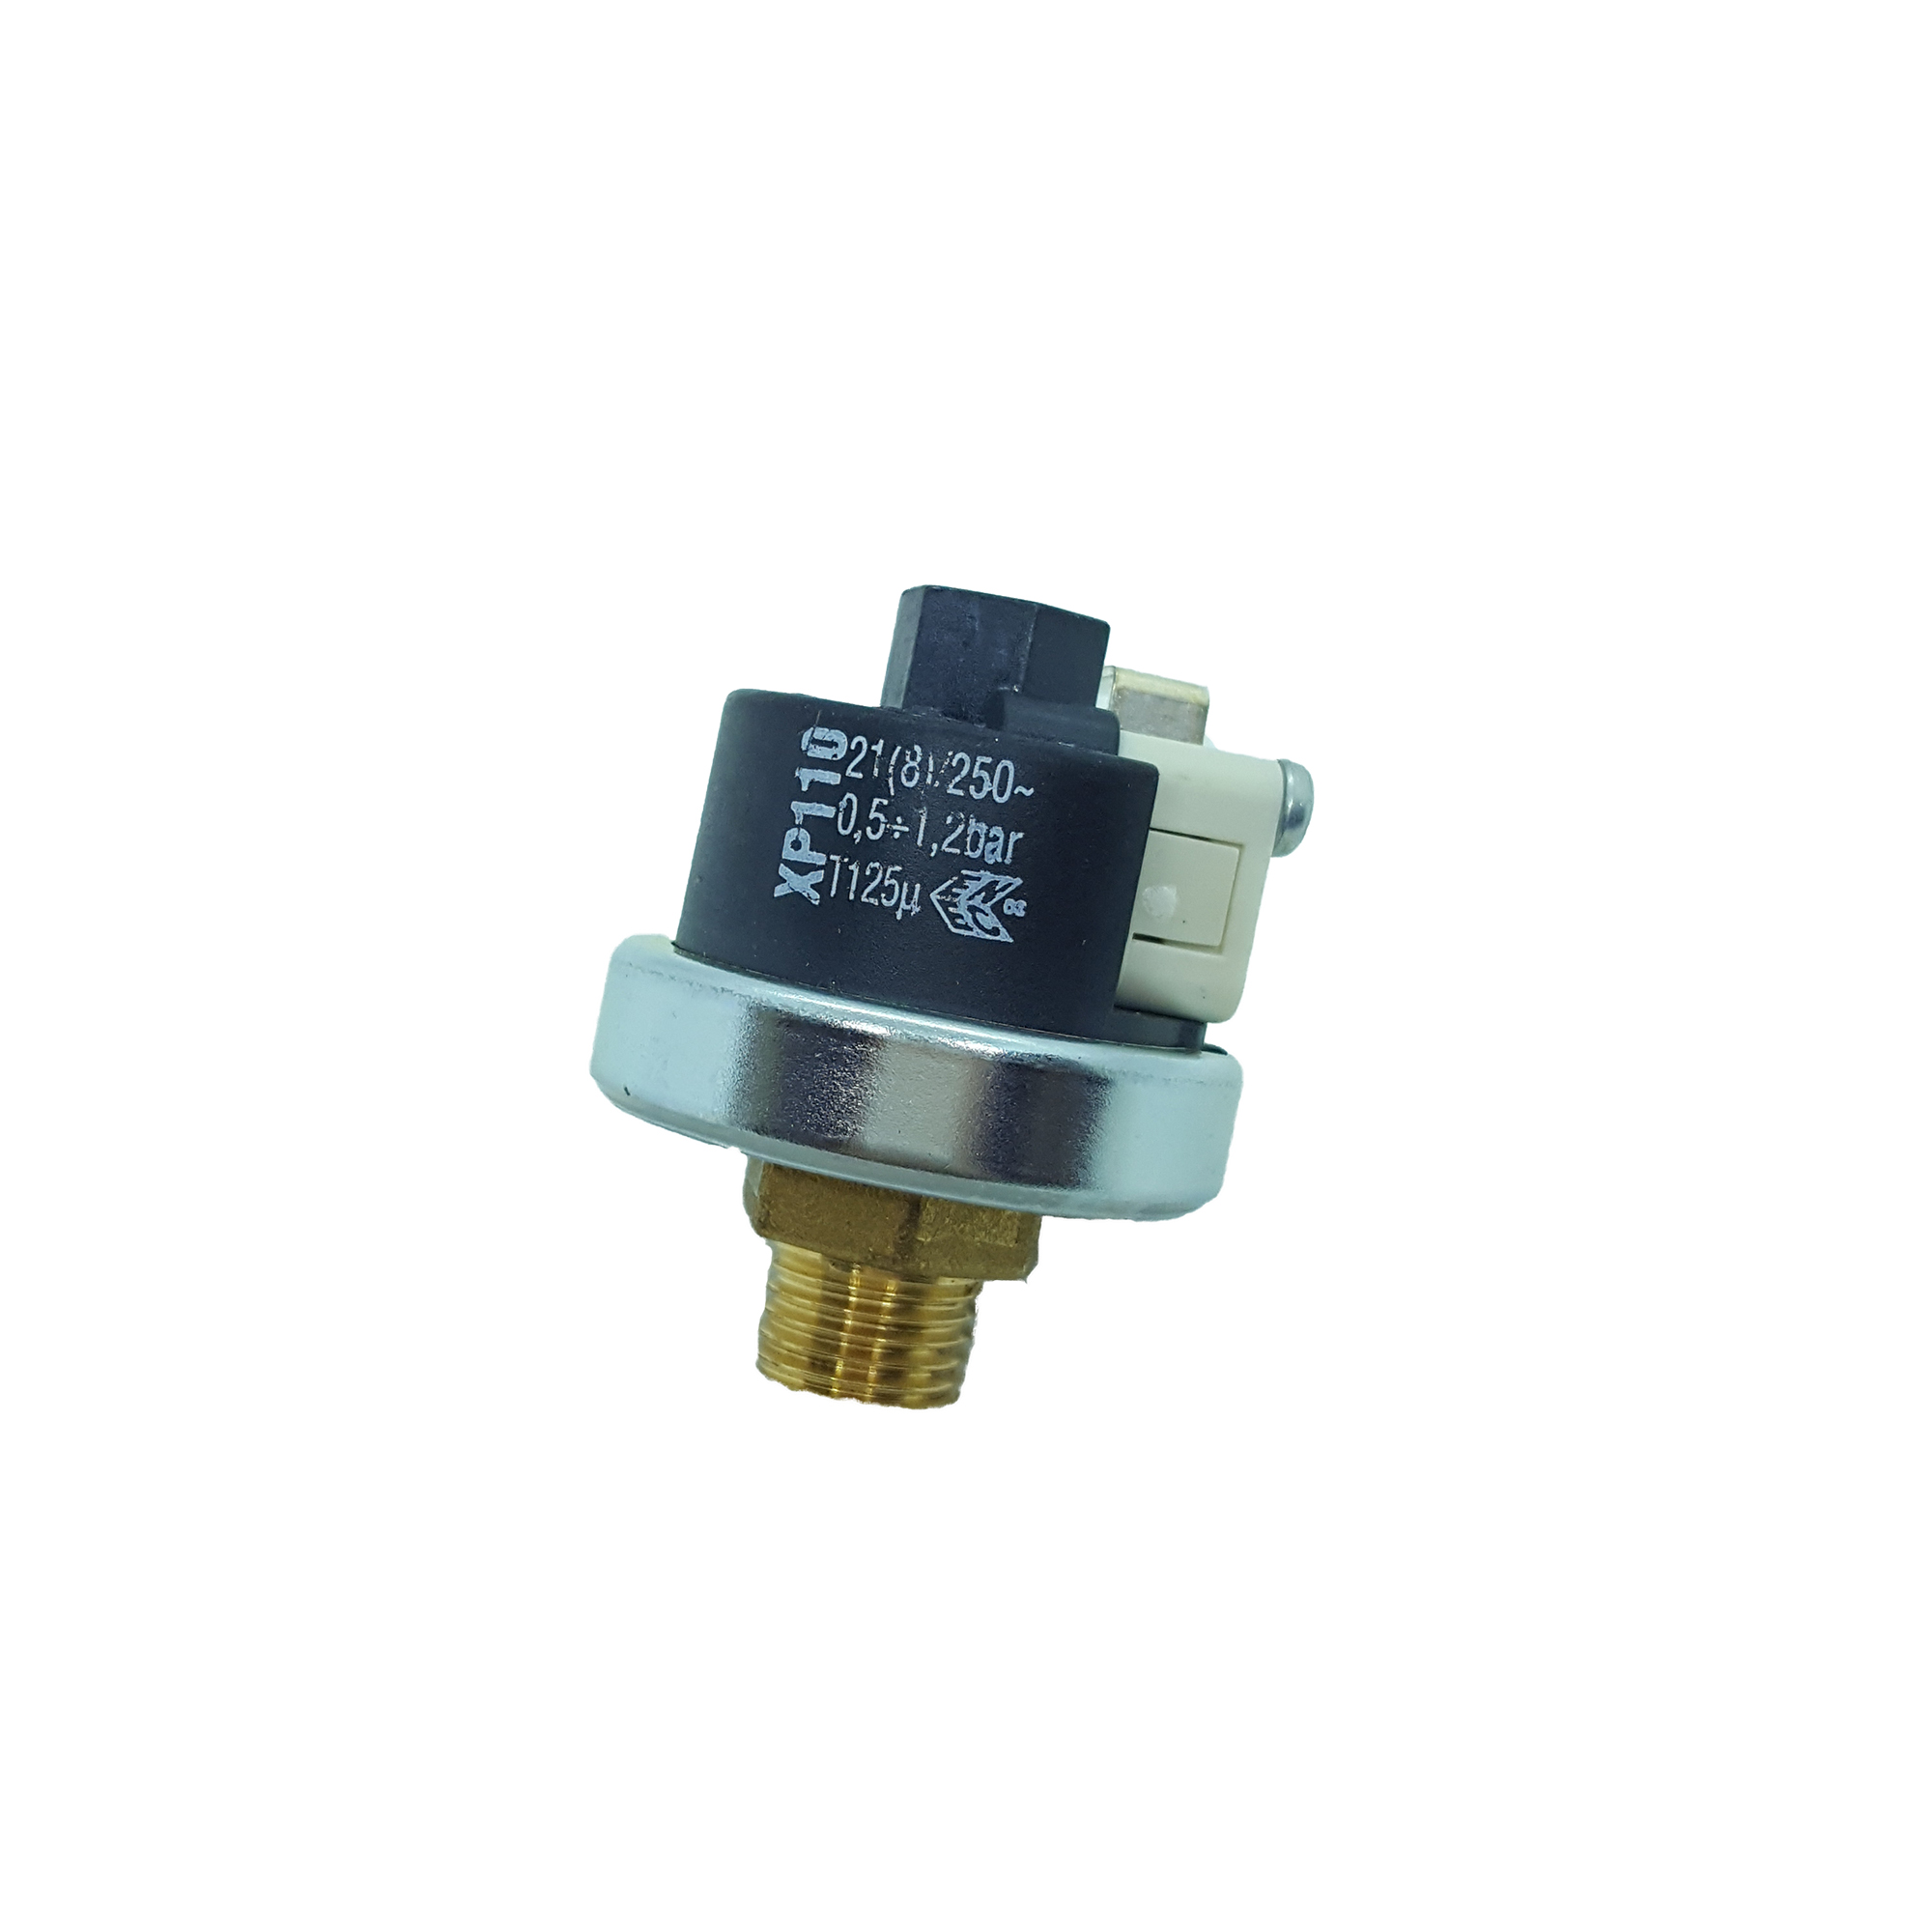 "Pressure Switch / PressureStat - XP110-PreCalibrated 1 Bar with 1/4"" std. fitting"